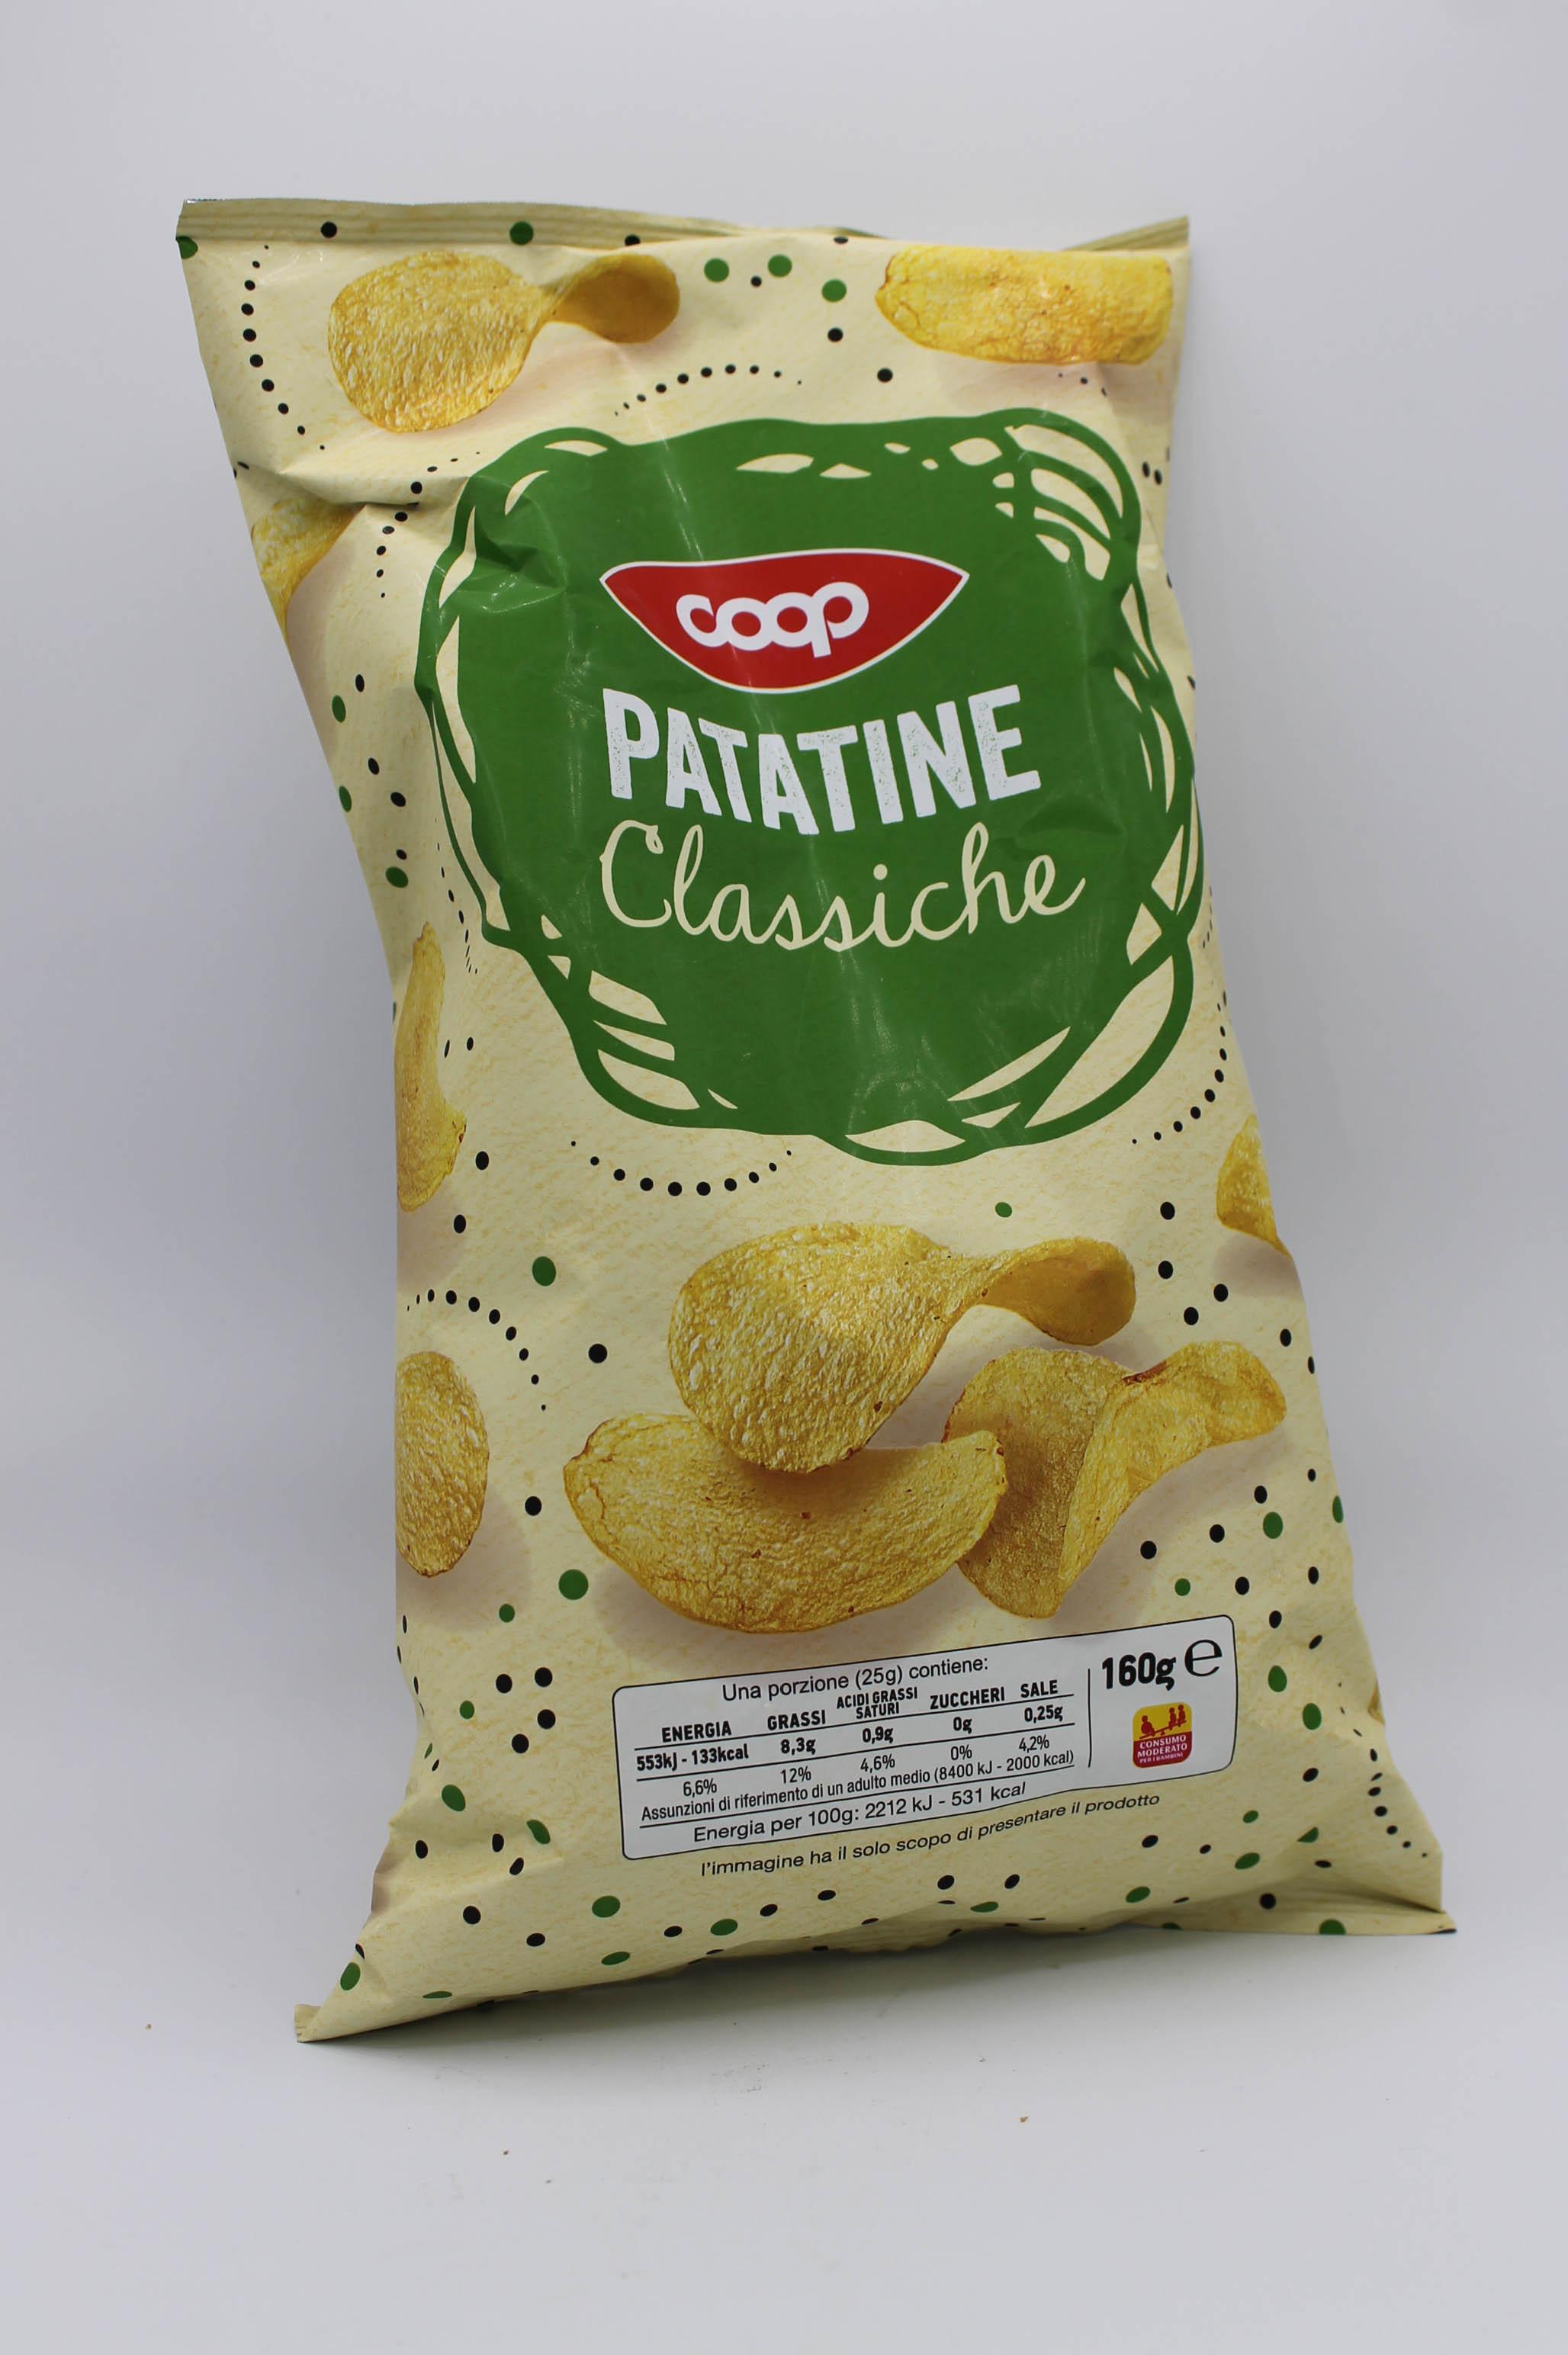 Coop patatine classiche 160gr.